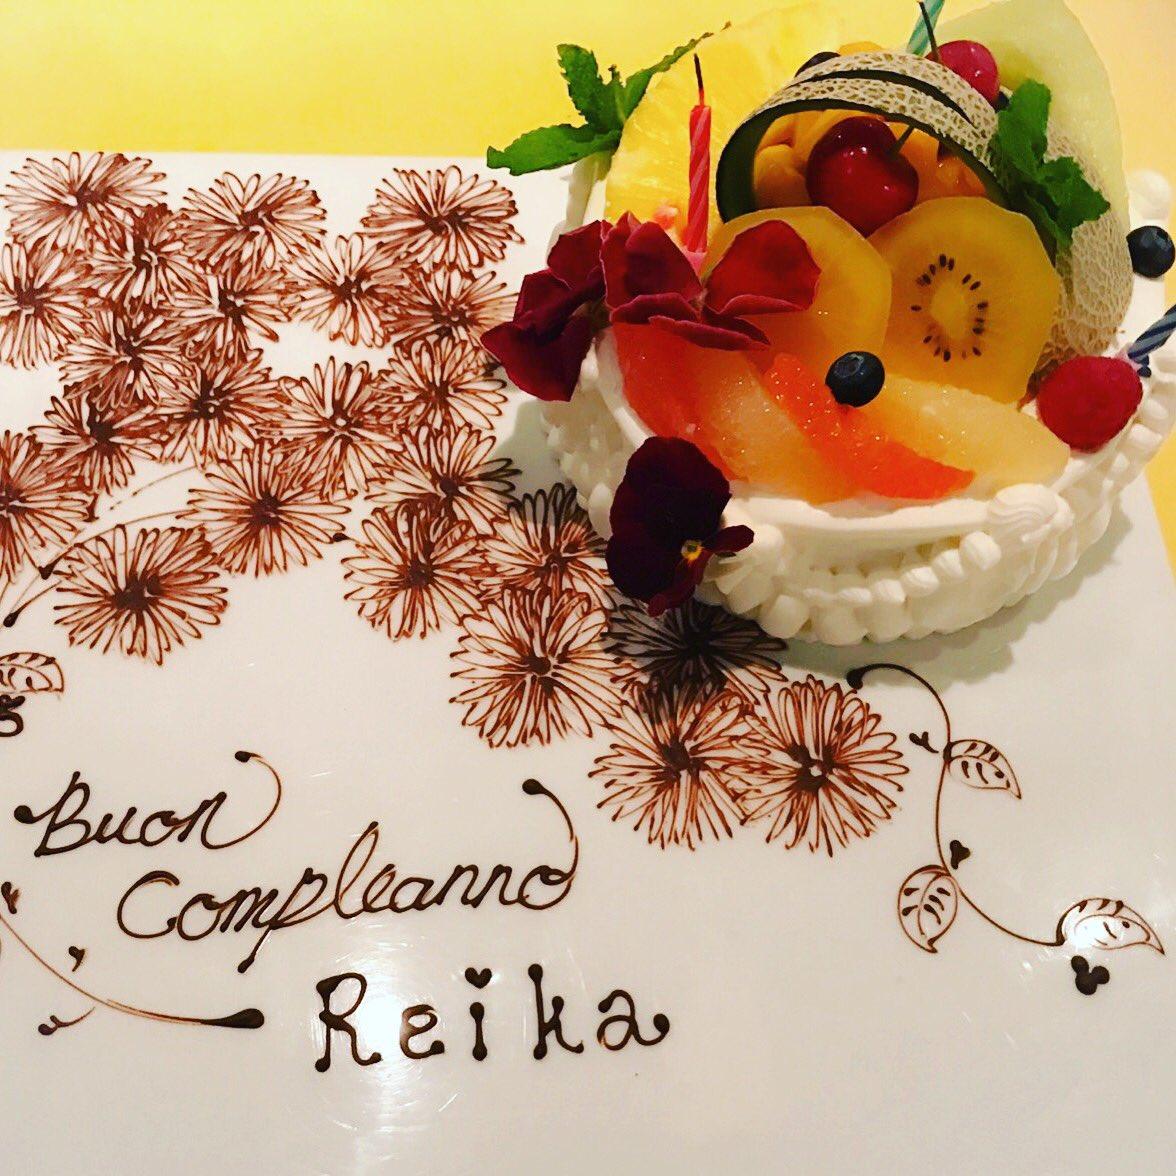 Buon Compleanno   Reika! https://t.co/Xg5ZlzOIpI